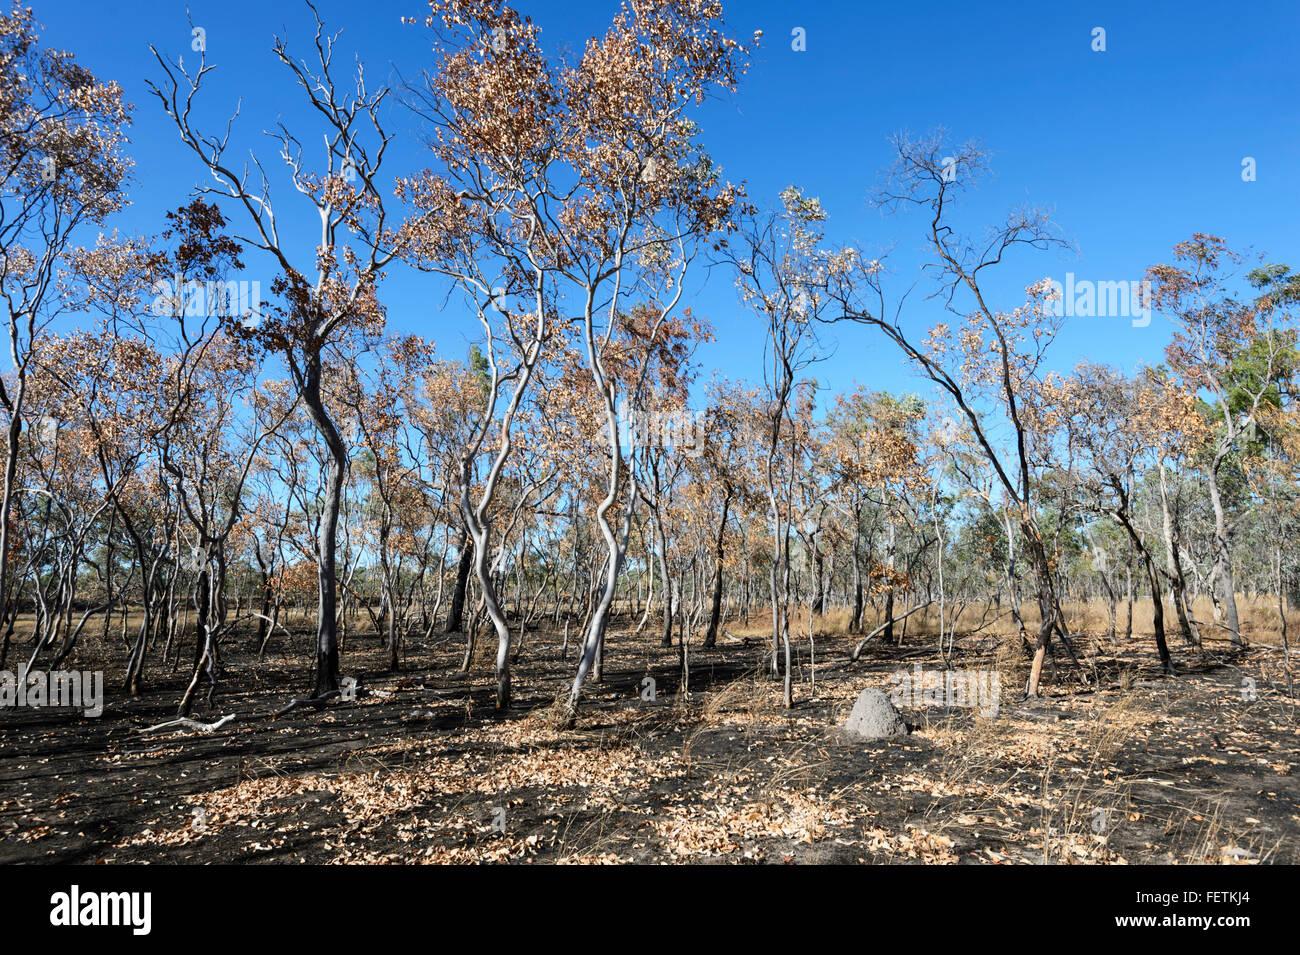 Bushfire Schaden, Gulf Savannah, Queensland, Queensland, Australien Stockbild